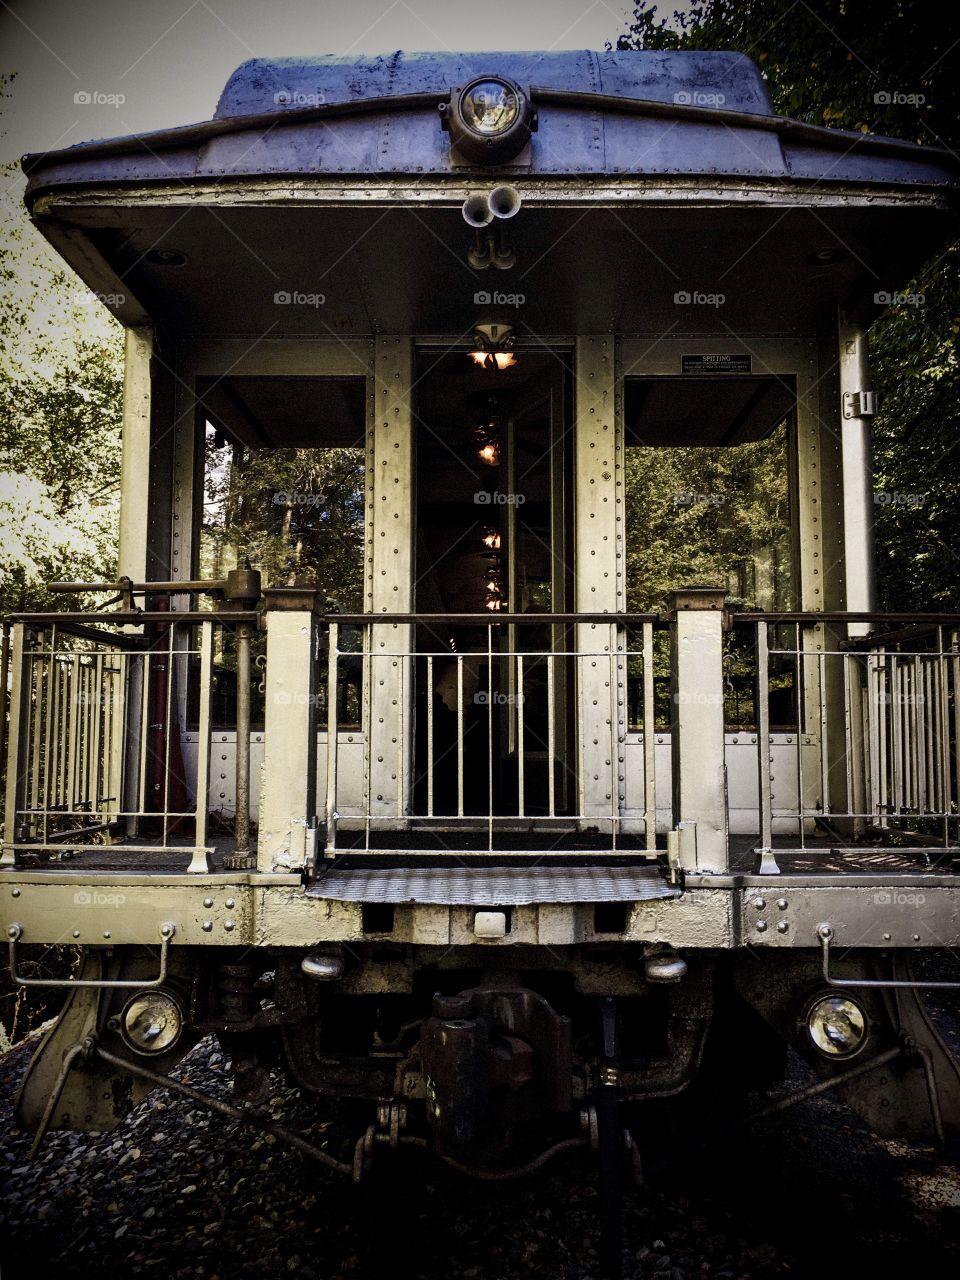 Train Parlor car